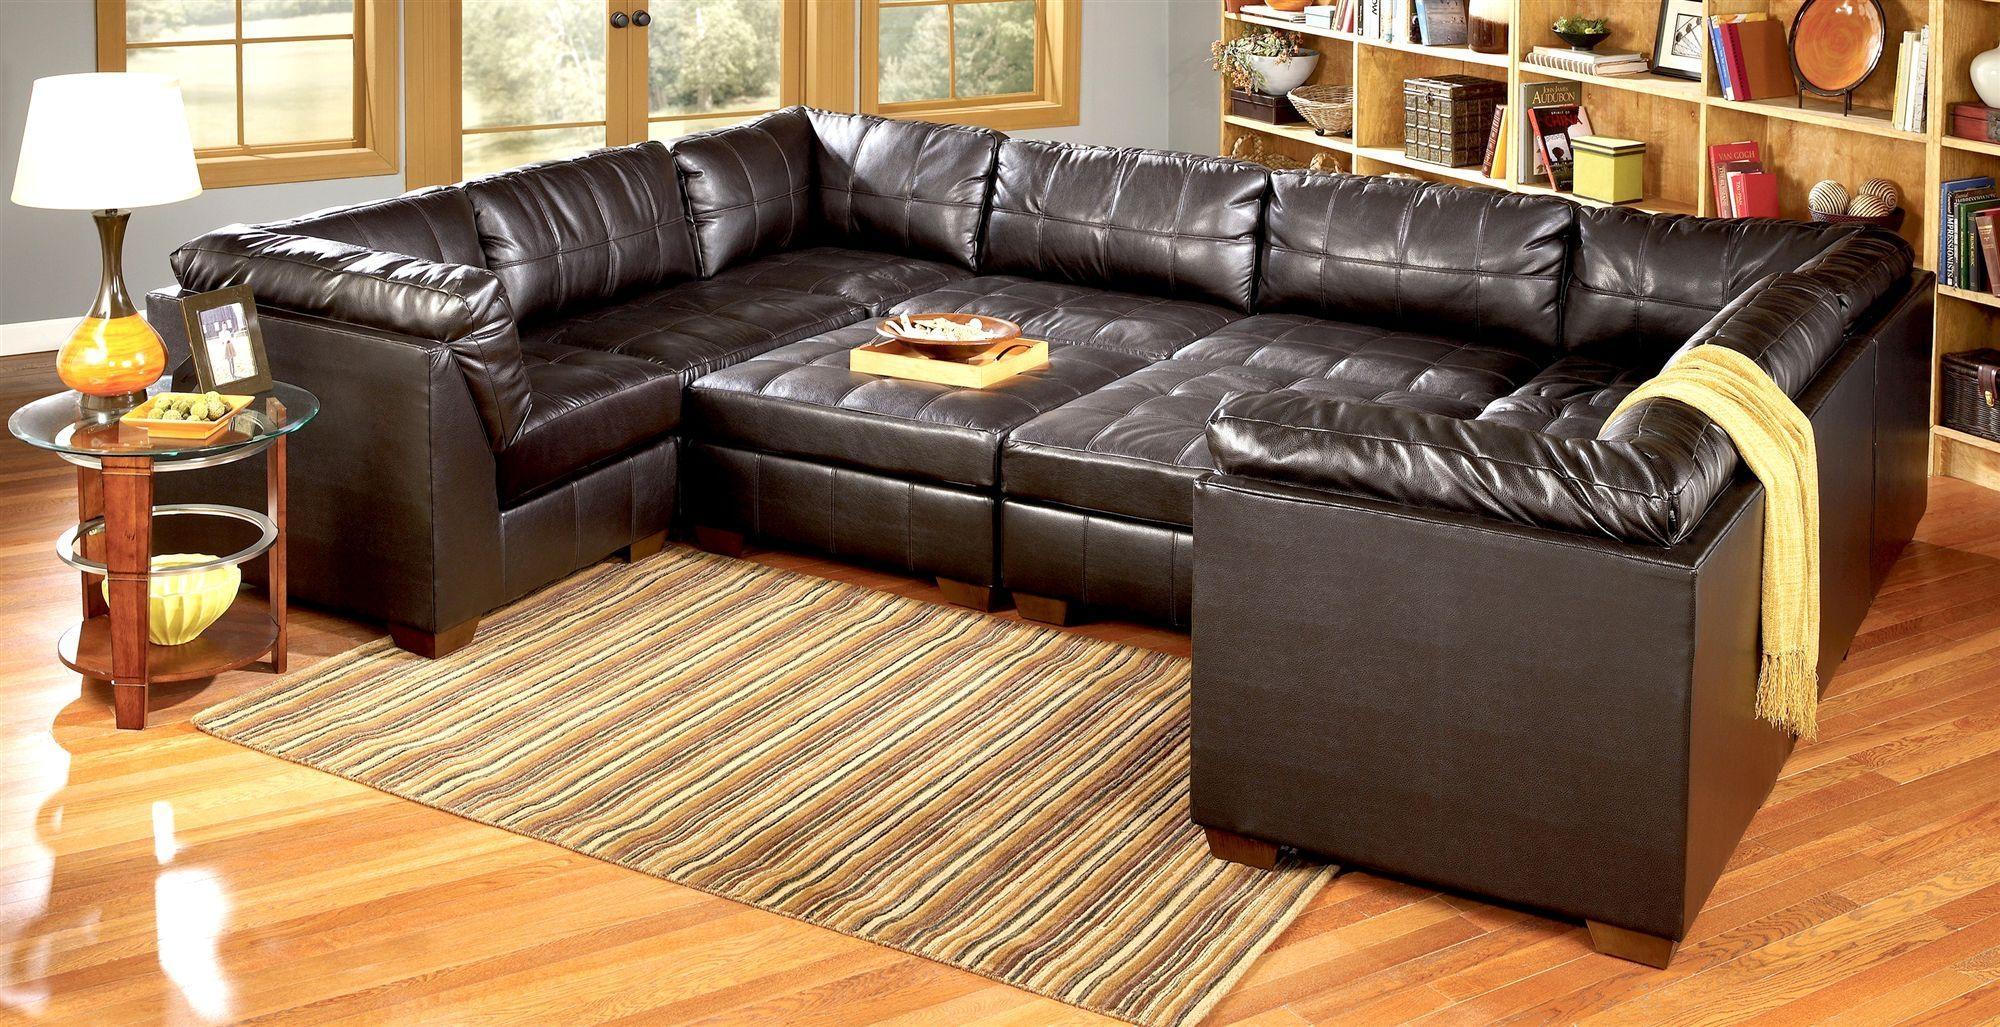 Ideal Modular Sectional Sofa Decor | Home Designjohn With Leather Modular Sectional Sofas (View 5 of 20)